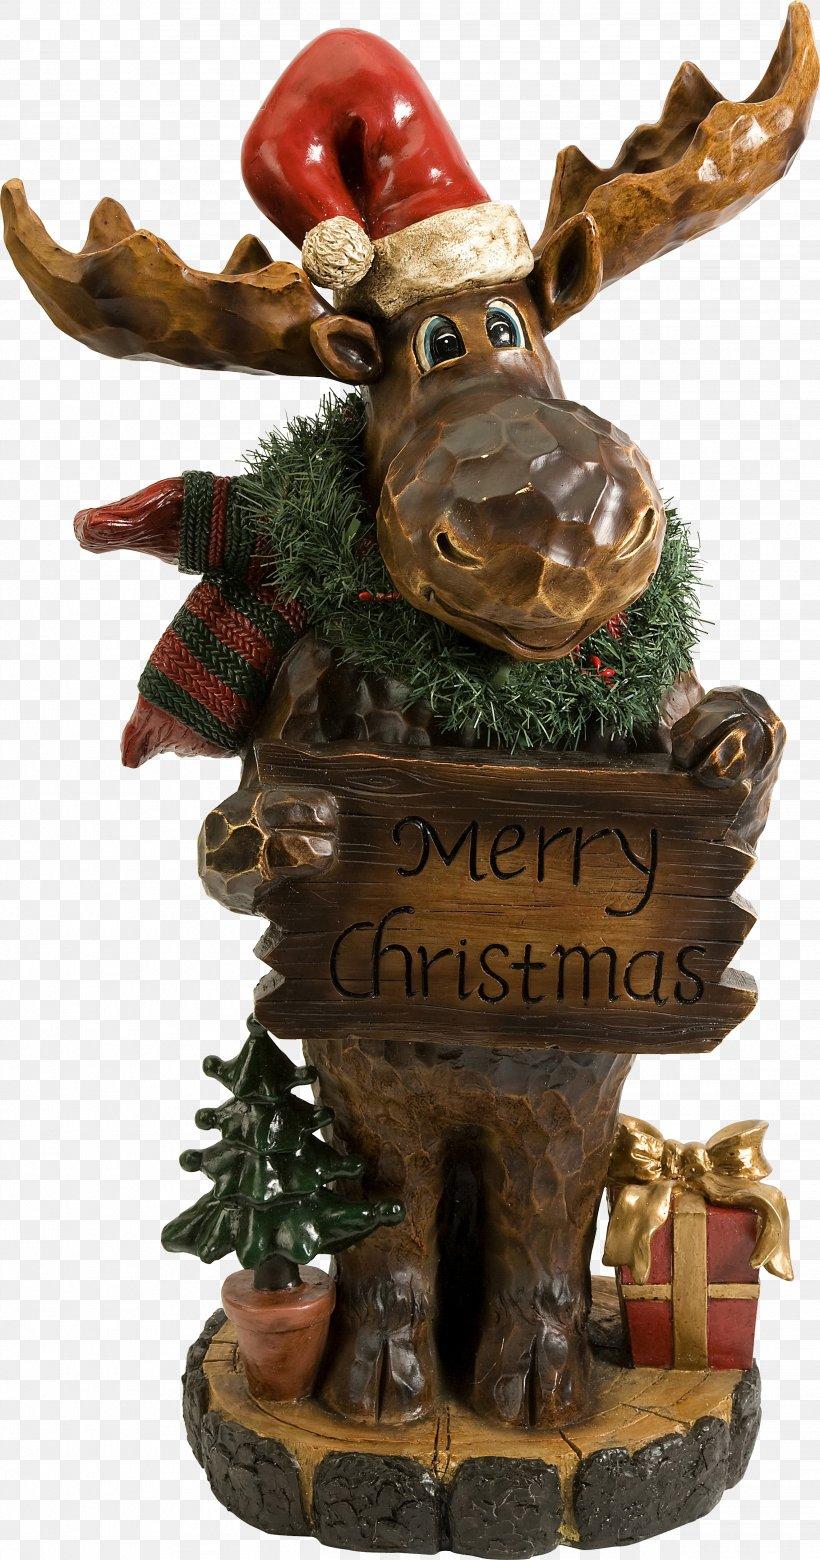 Merry Christmas Sculpture Antler Holiday Decor